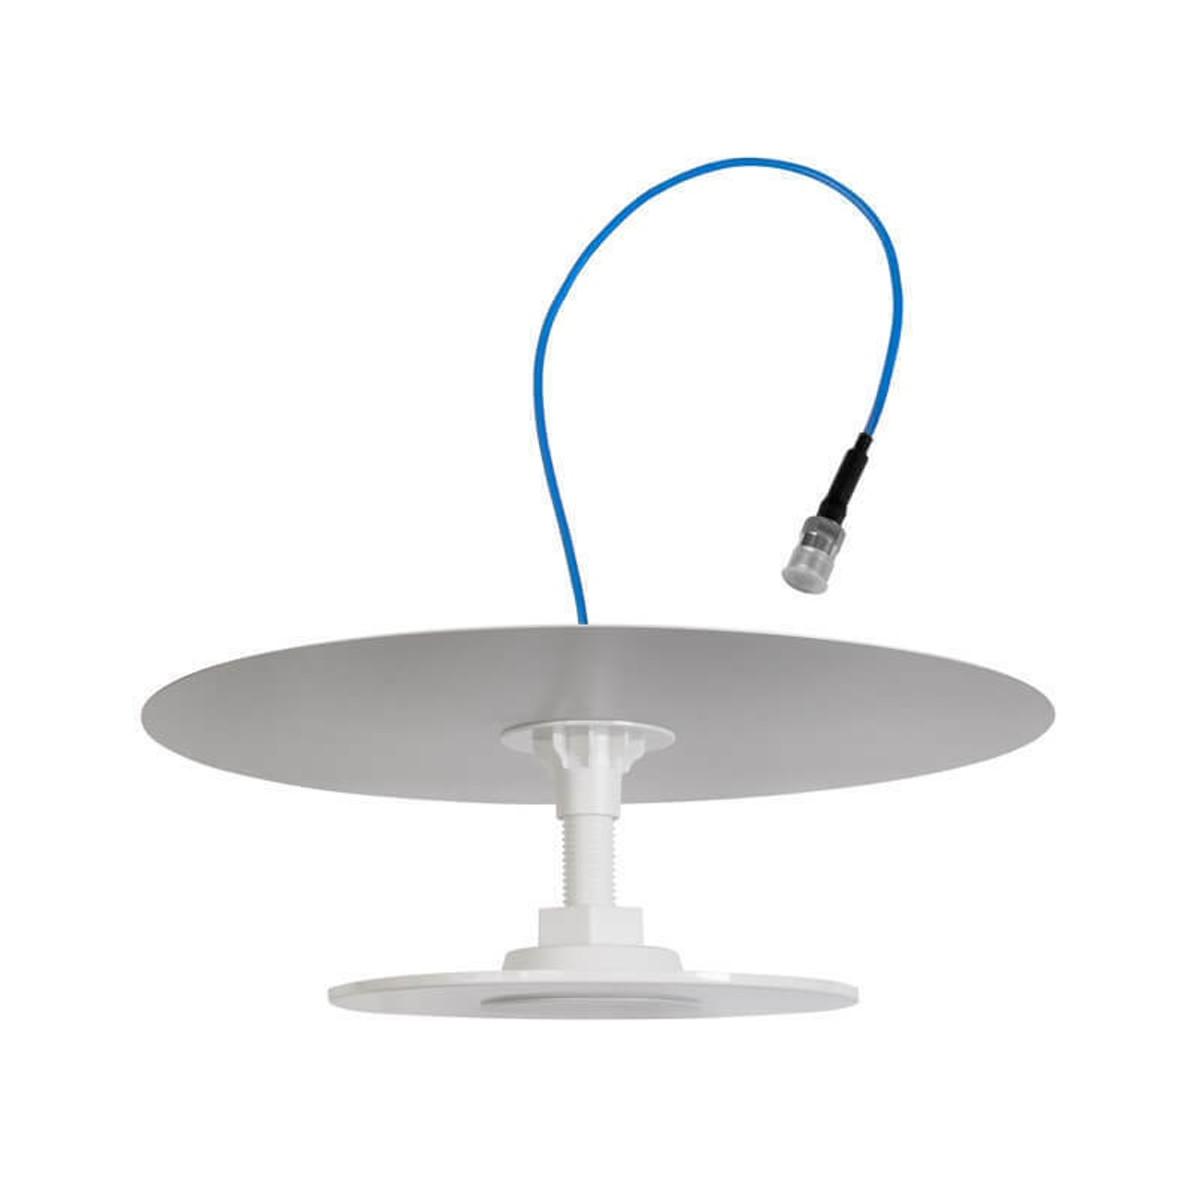 Wilson 4G Low-Profile Dome Antenna w/Reflector, 50 Ohm - 314406